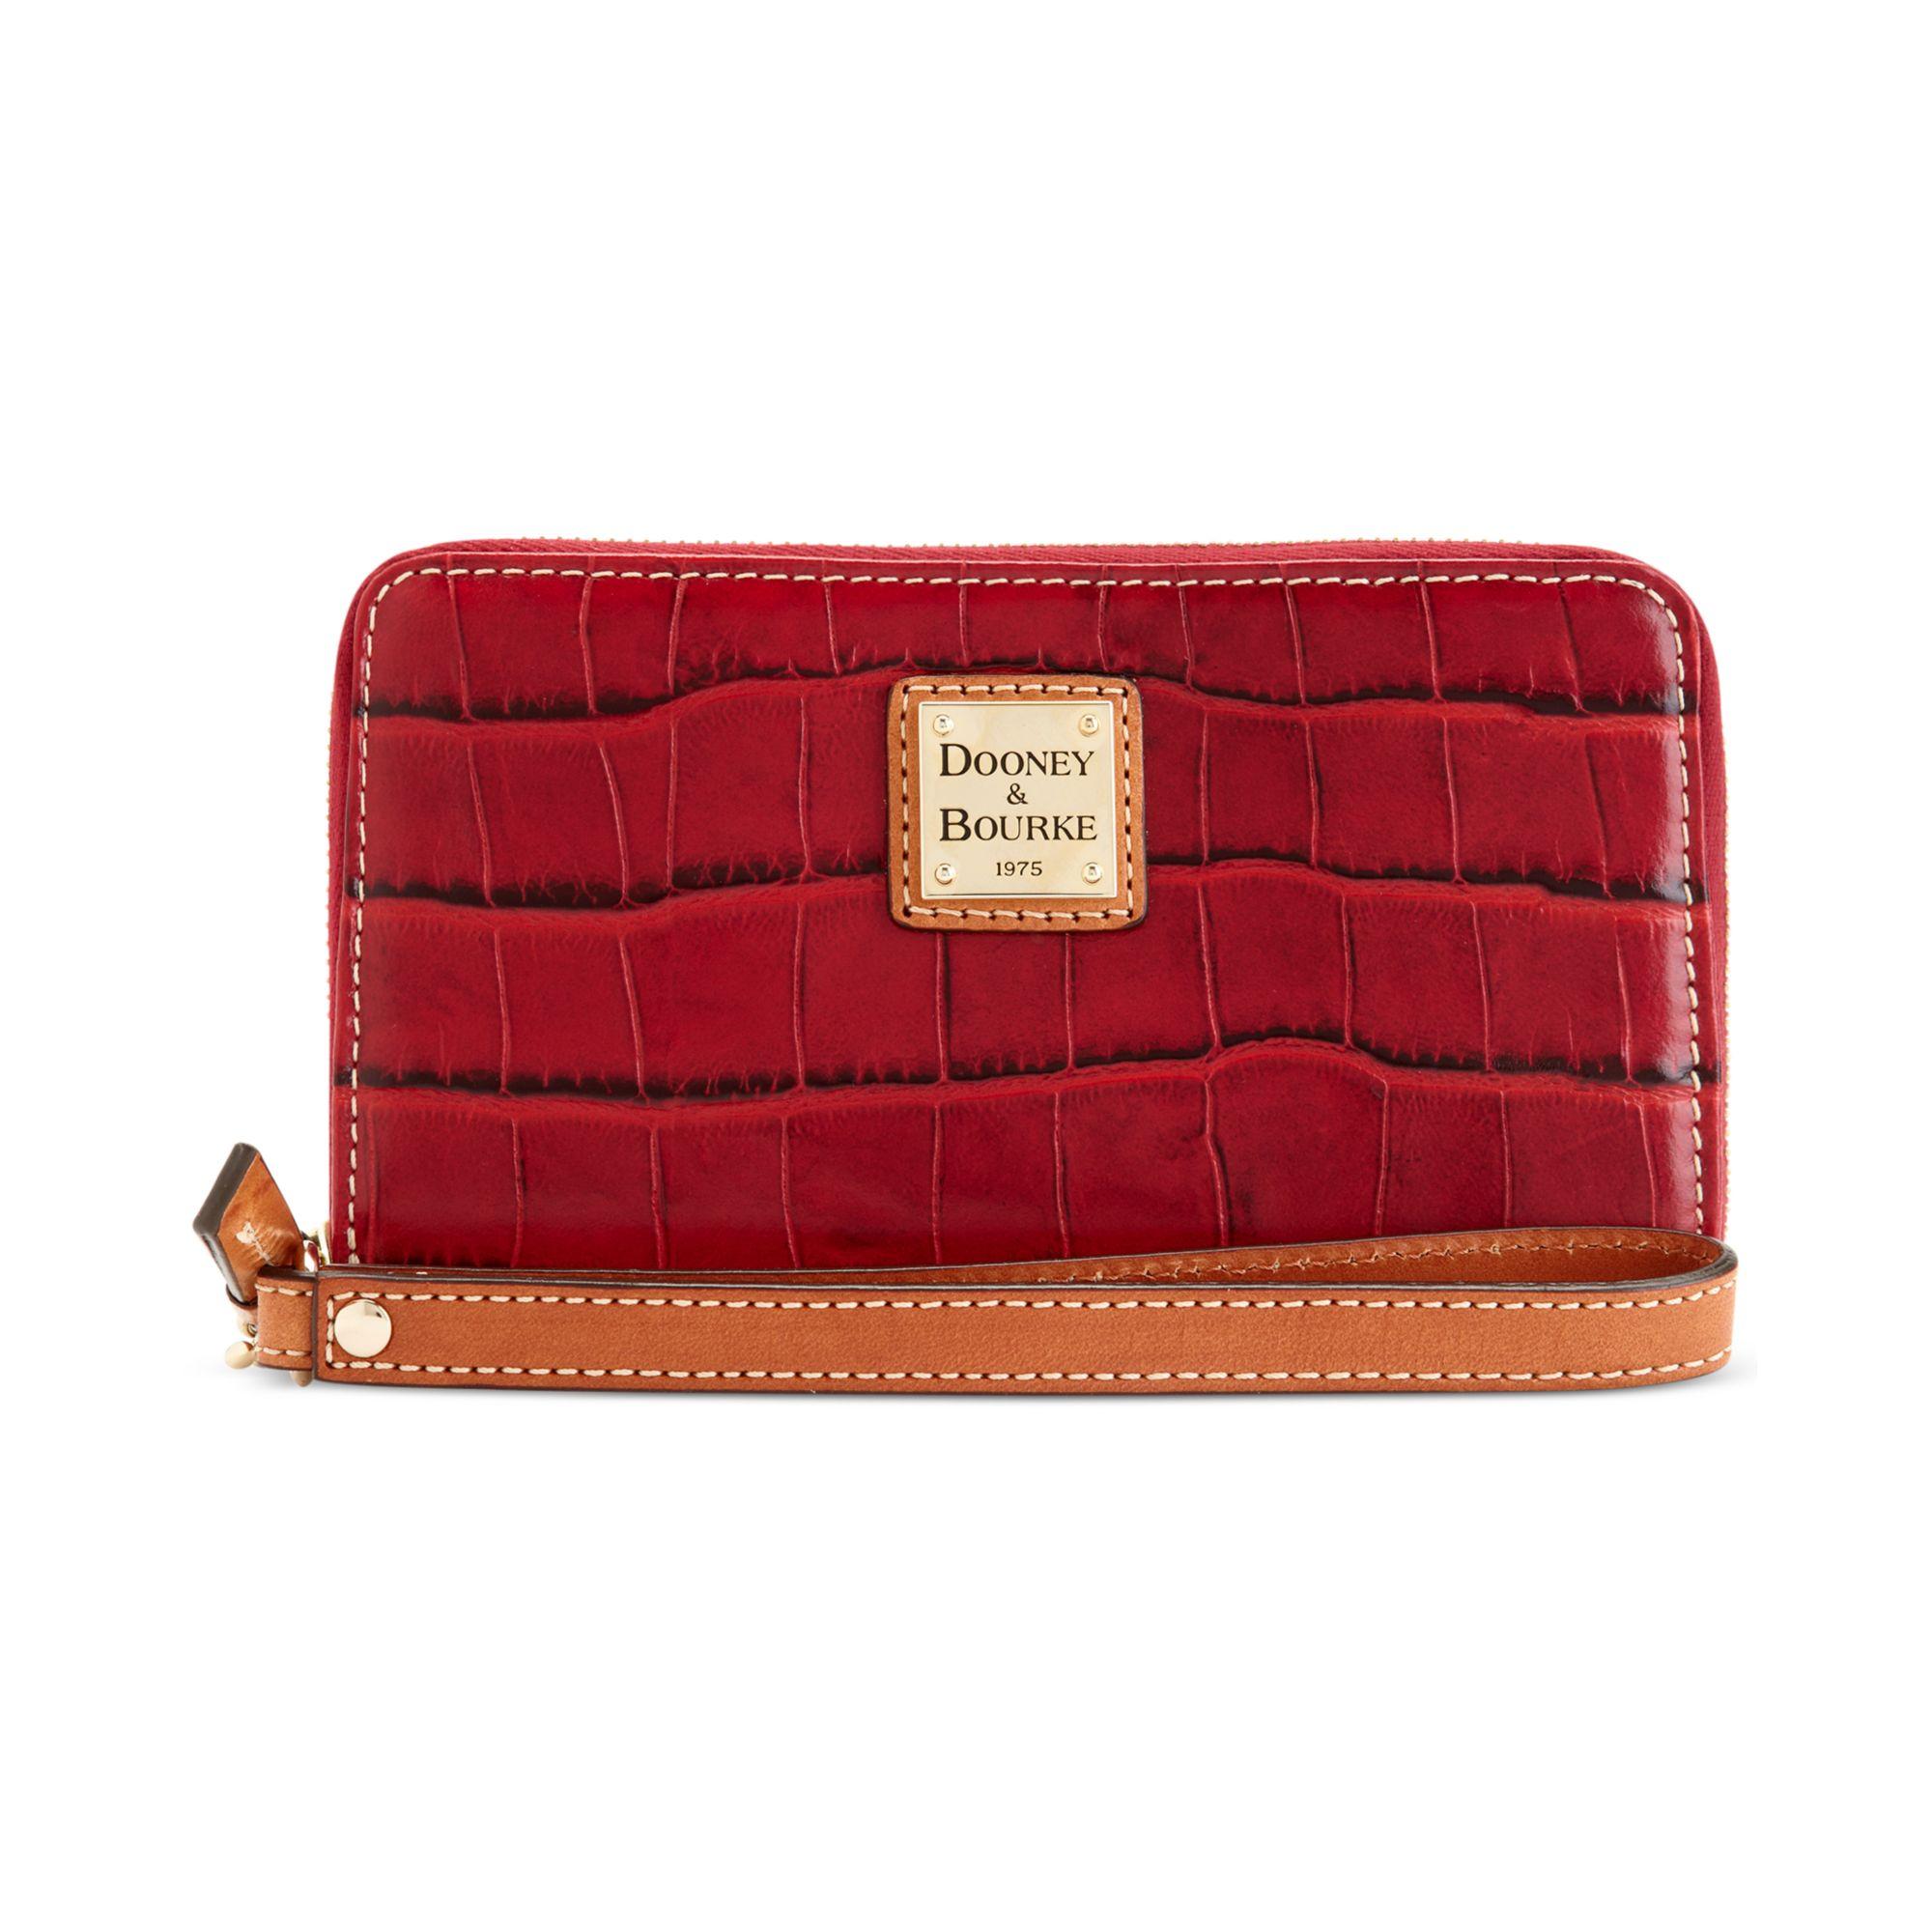 Dooney Bourke Croco Hobo Red Women Handbags Purses And Backpakcs Lord Taylor